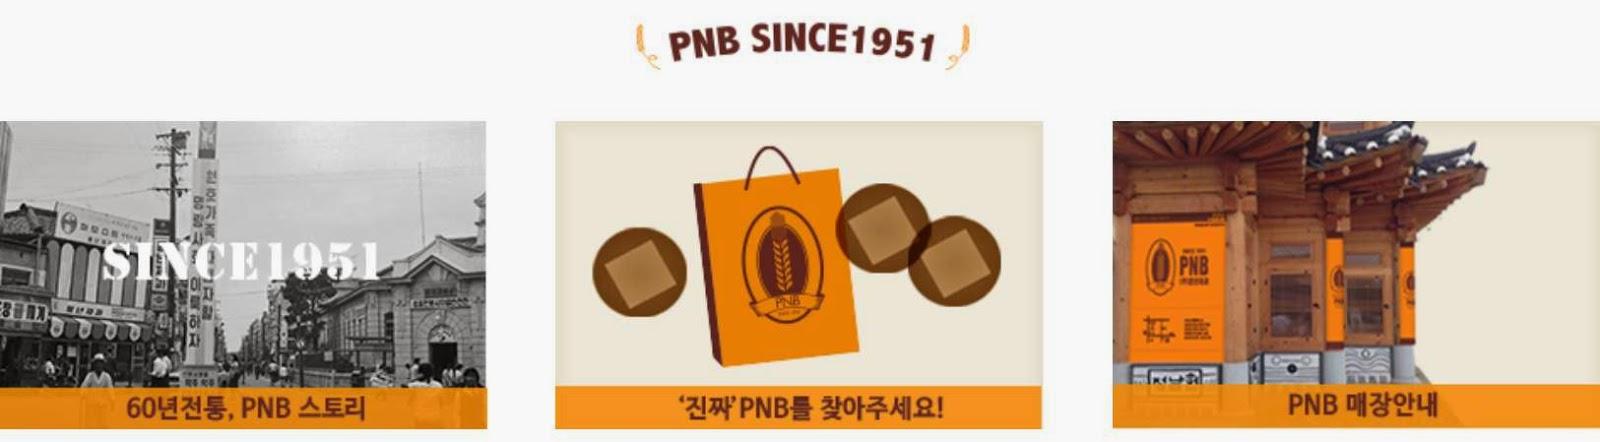 Jeonju - PNB Confectionery 풍년제과 | meheartseoul.blogspot.com